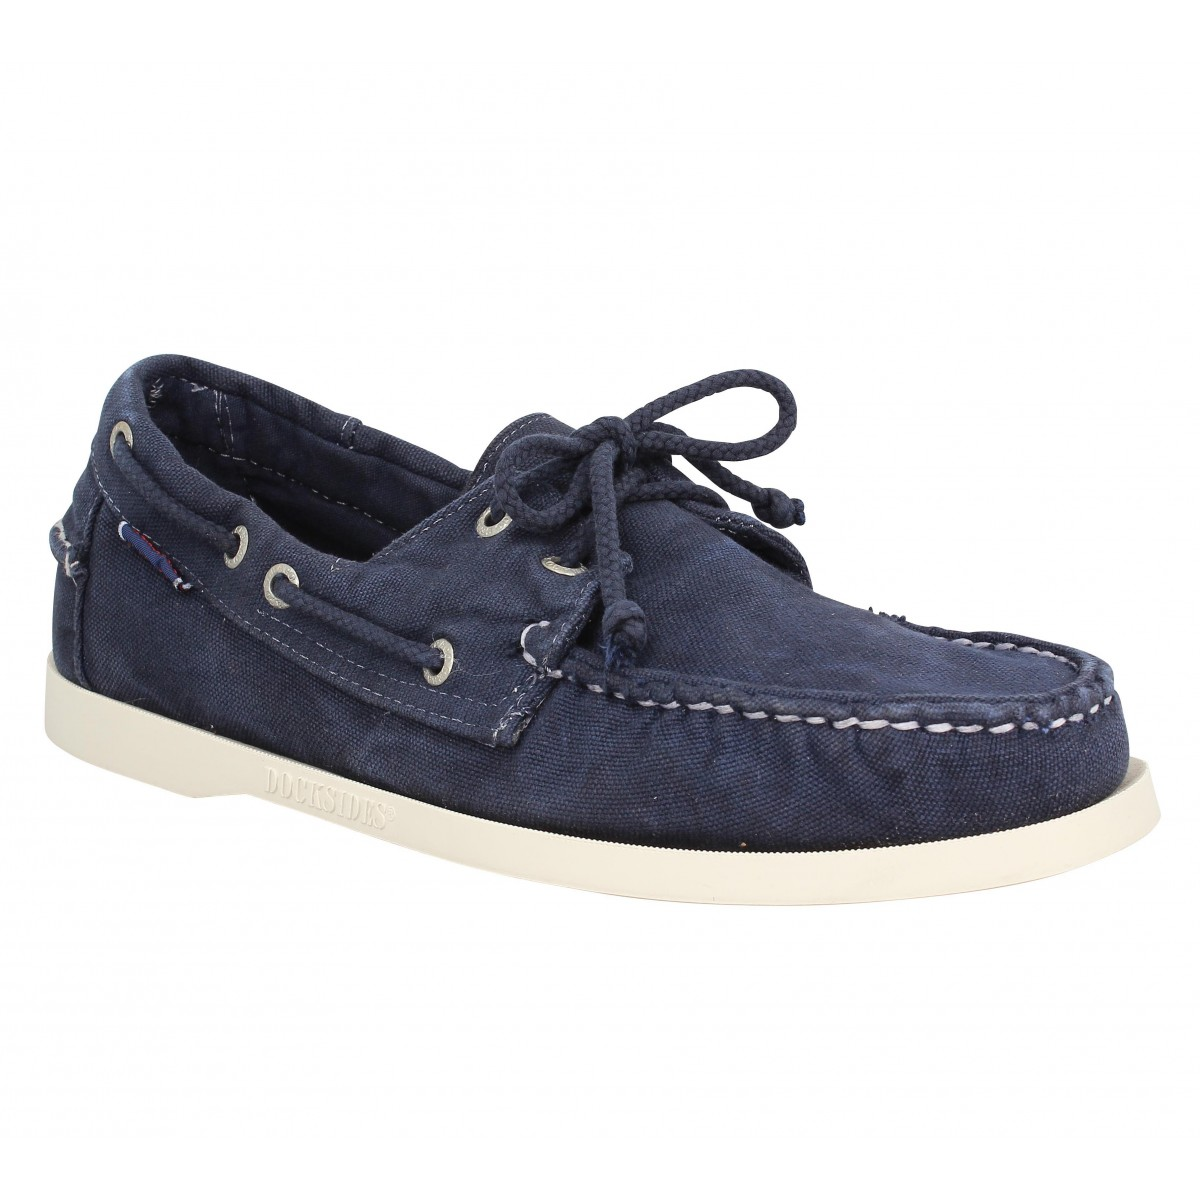 Chaussures bateaux SEBAGO Docksides toile Marine